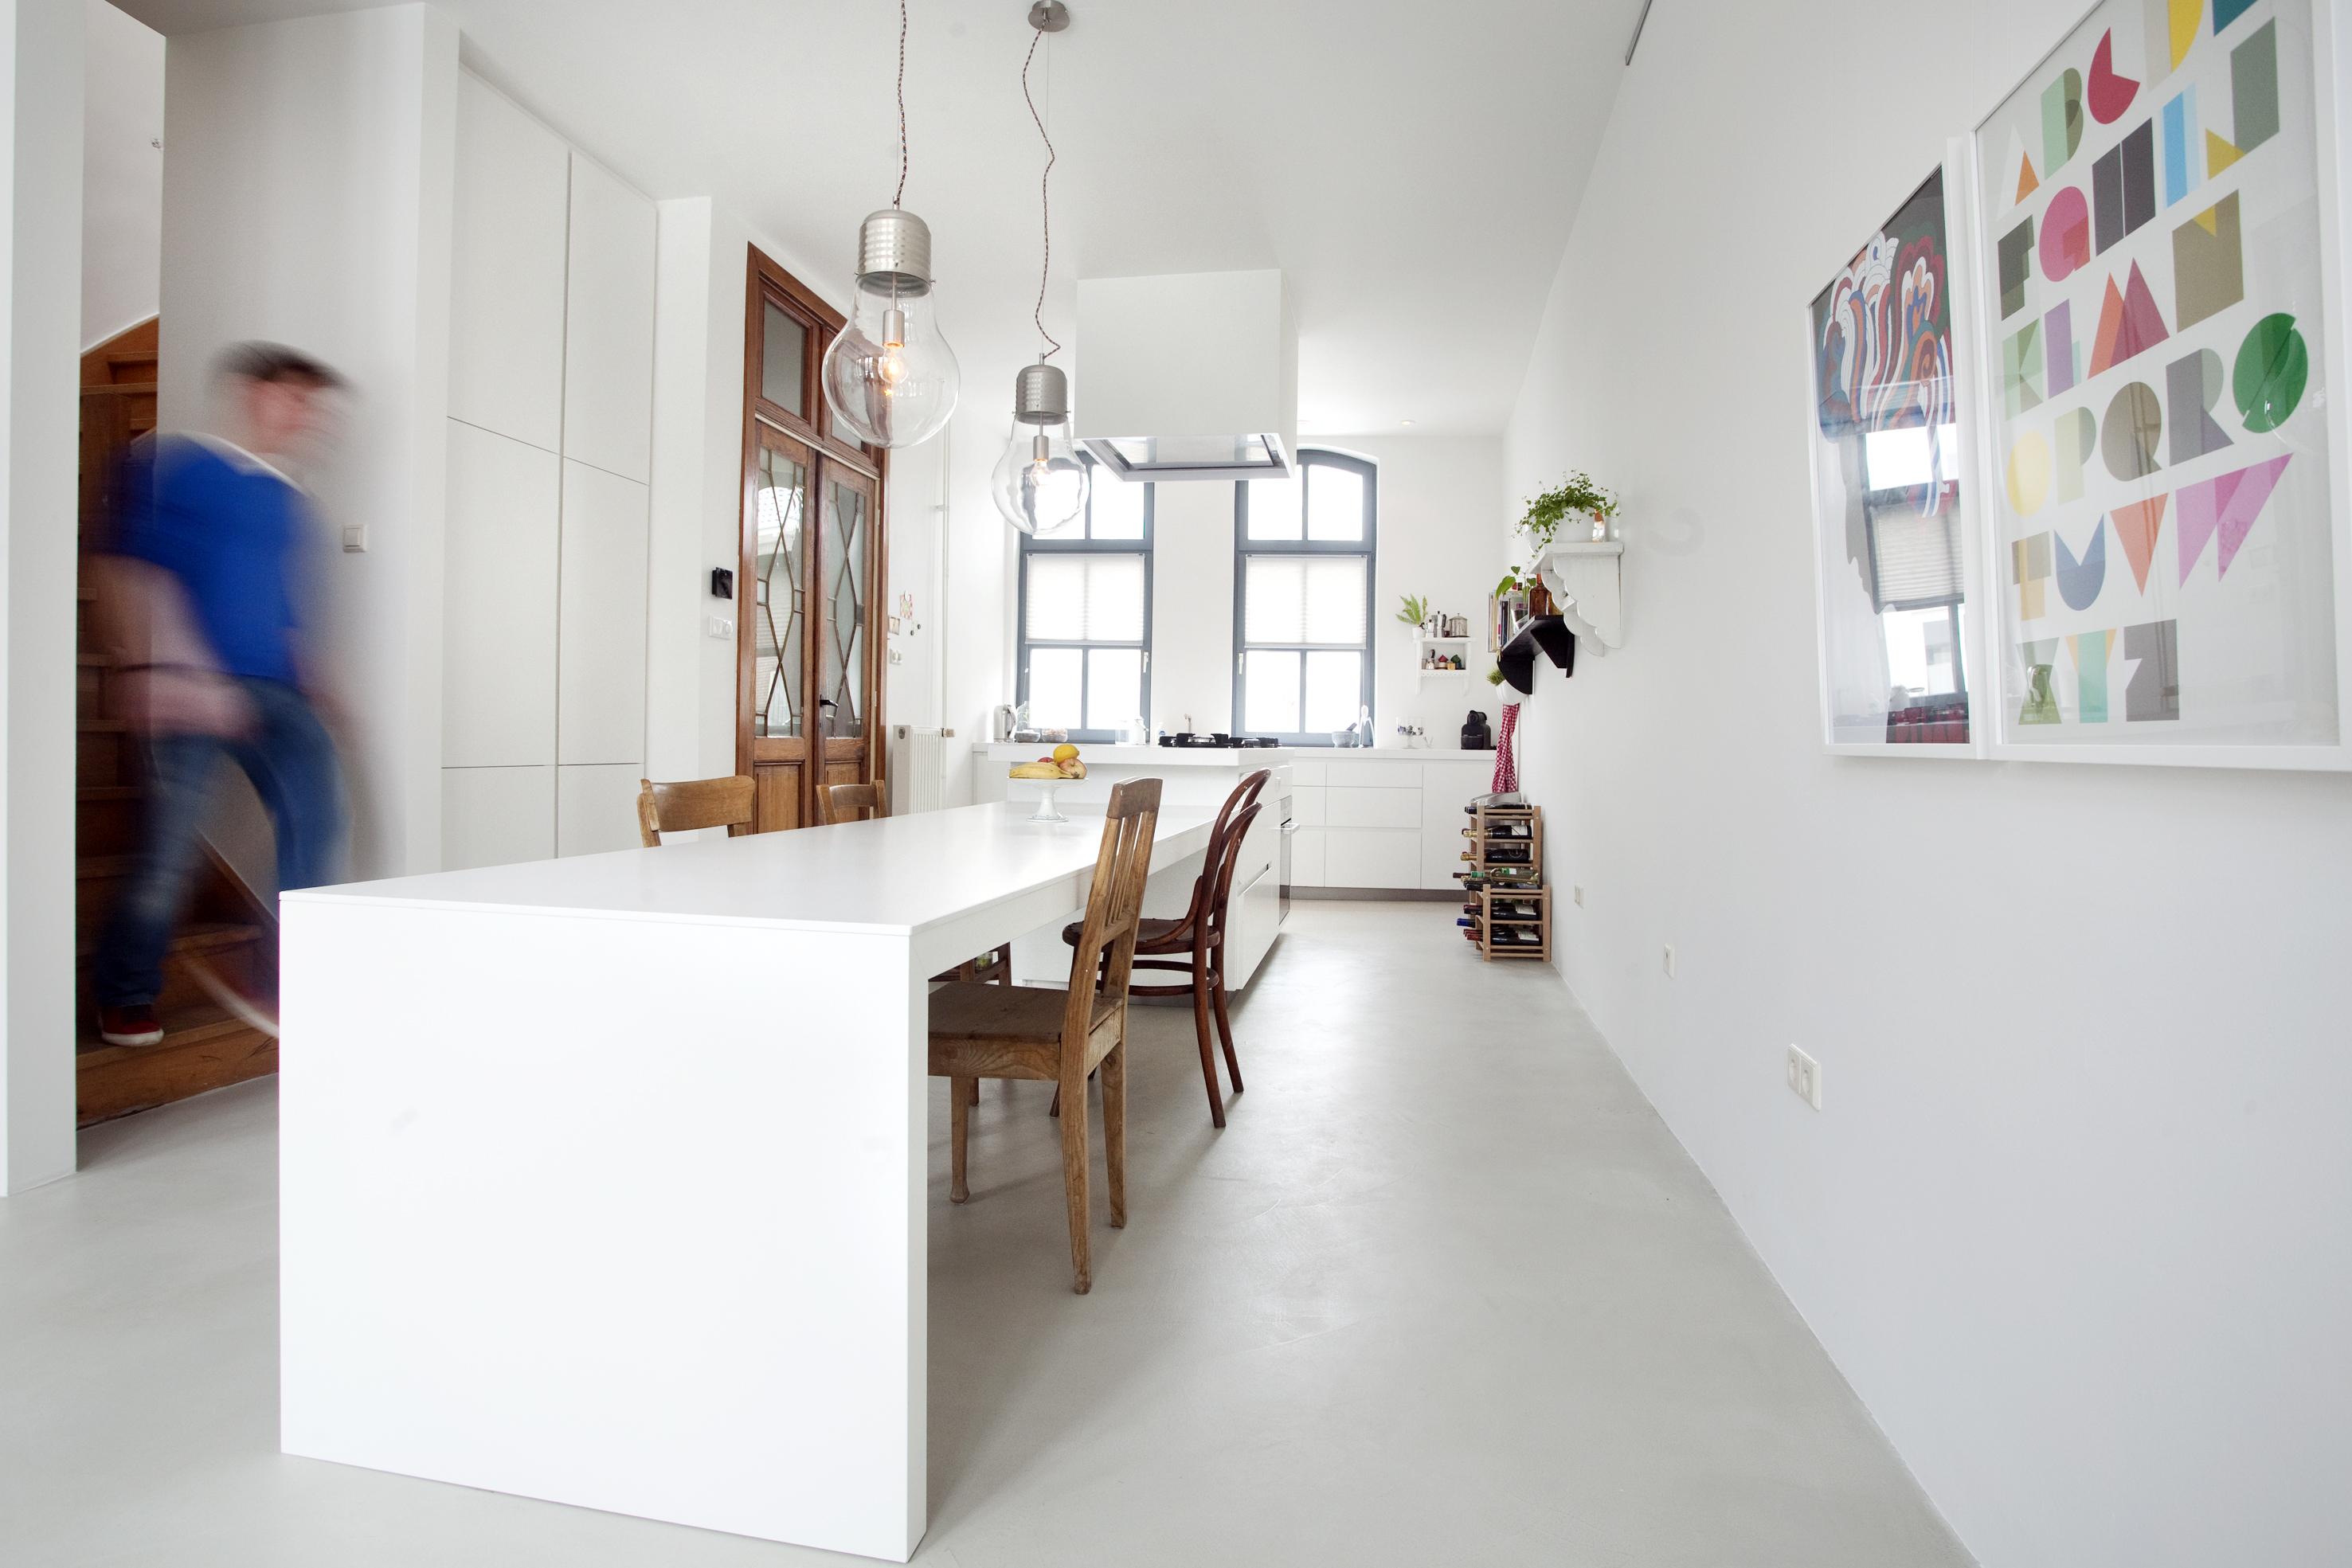 Ondernemer: paul bovens architectural design – beleef bemelen